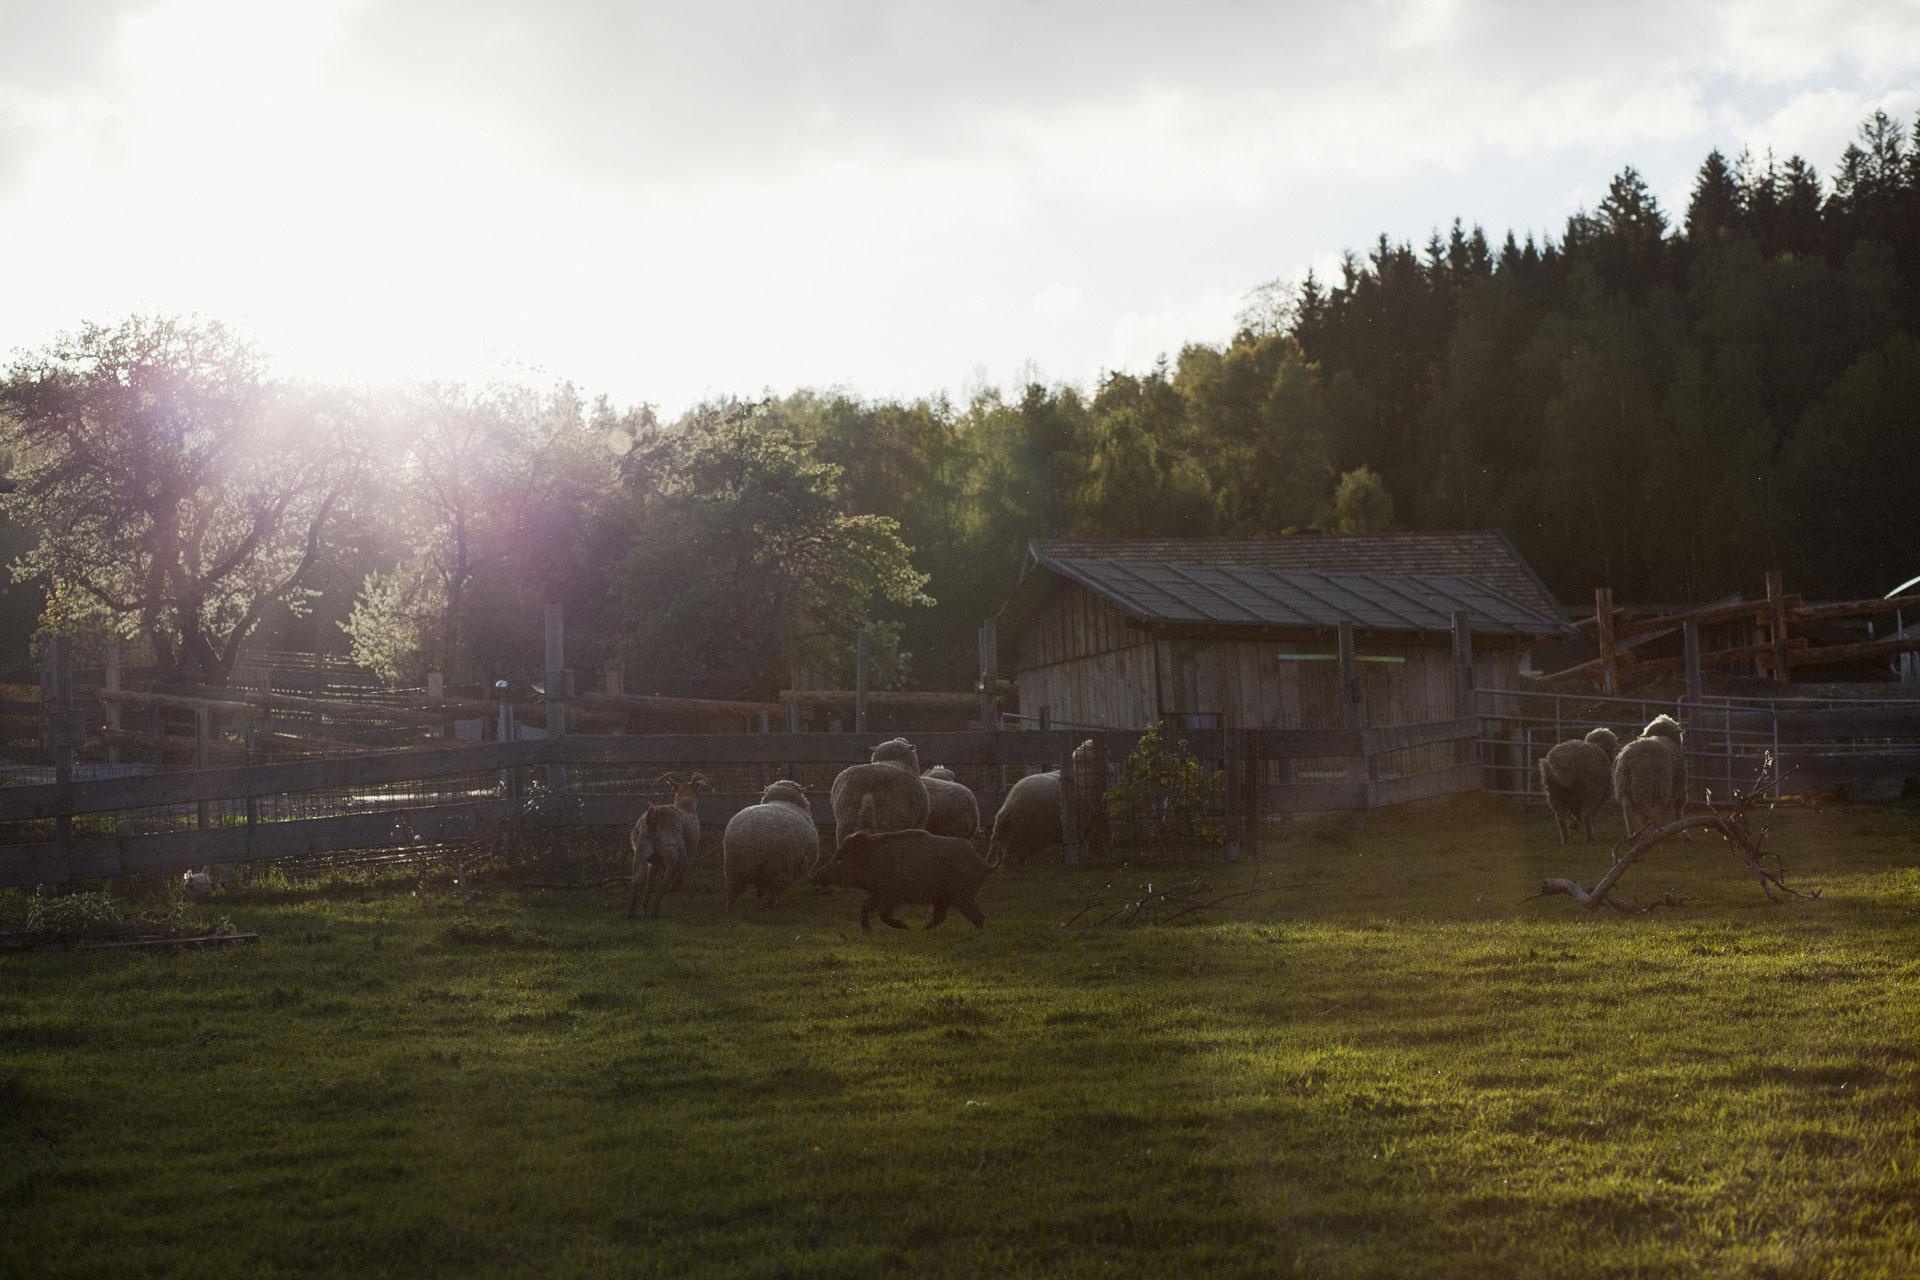 timo-stammberger-photography-fotografie-tiere-animals-nature-erdlingshof-vegan-world-tiere-vegan-compassion